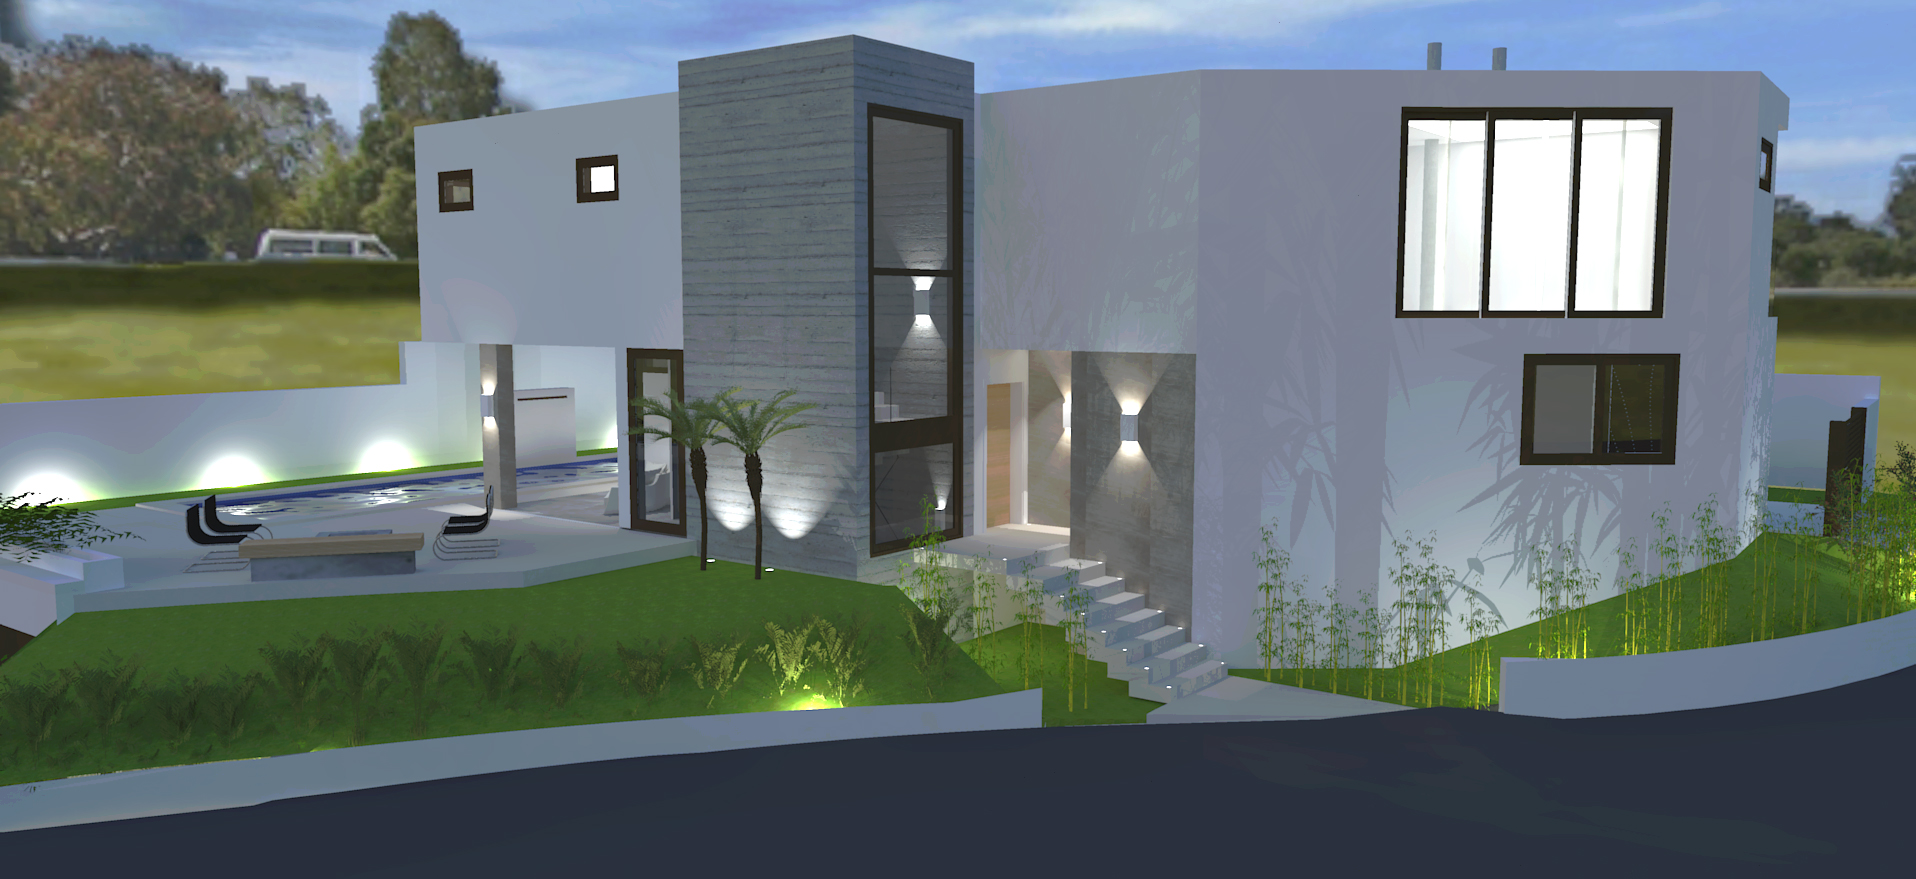 midrie-arquitetura-Residencia1_v5.jpg